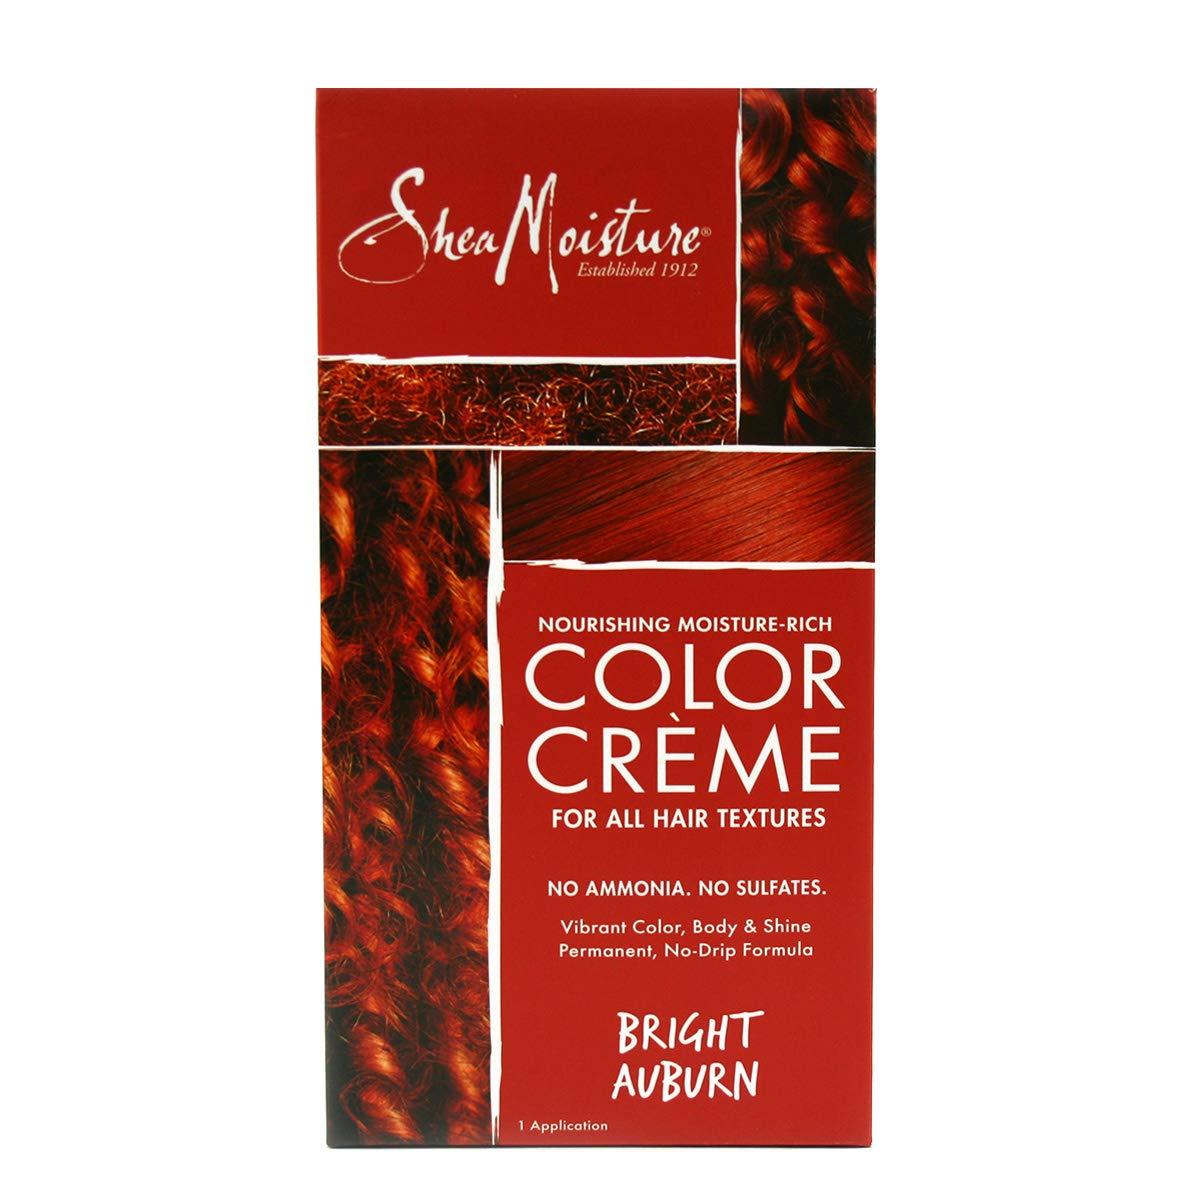 Nourishing Moisture Rich Hair Color System Bright Auburn By Shea